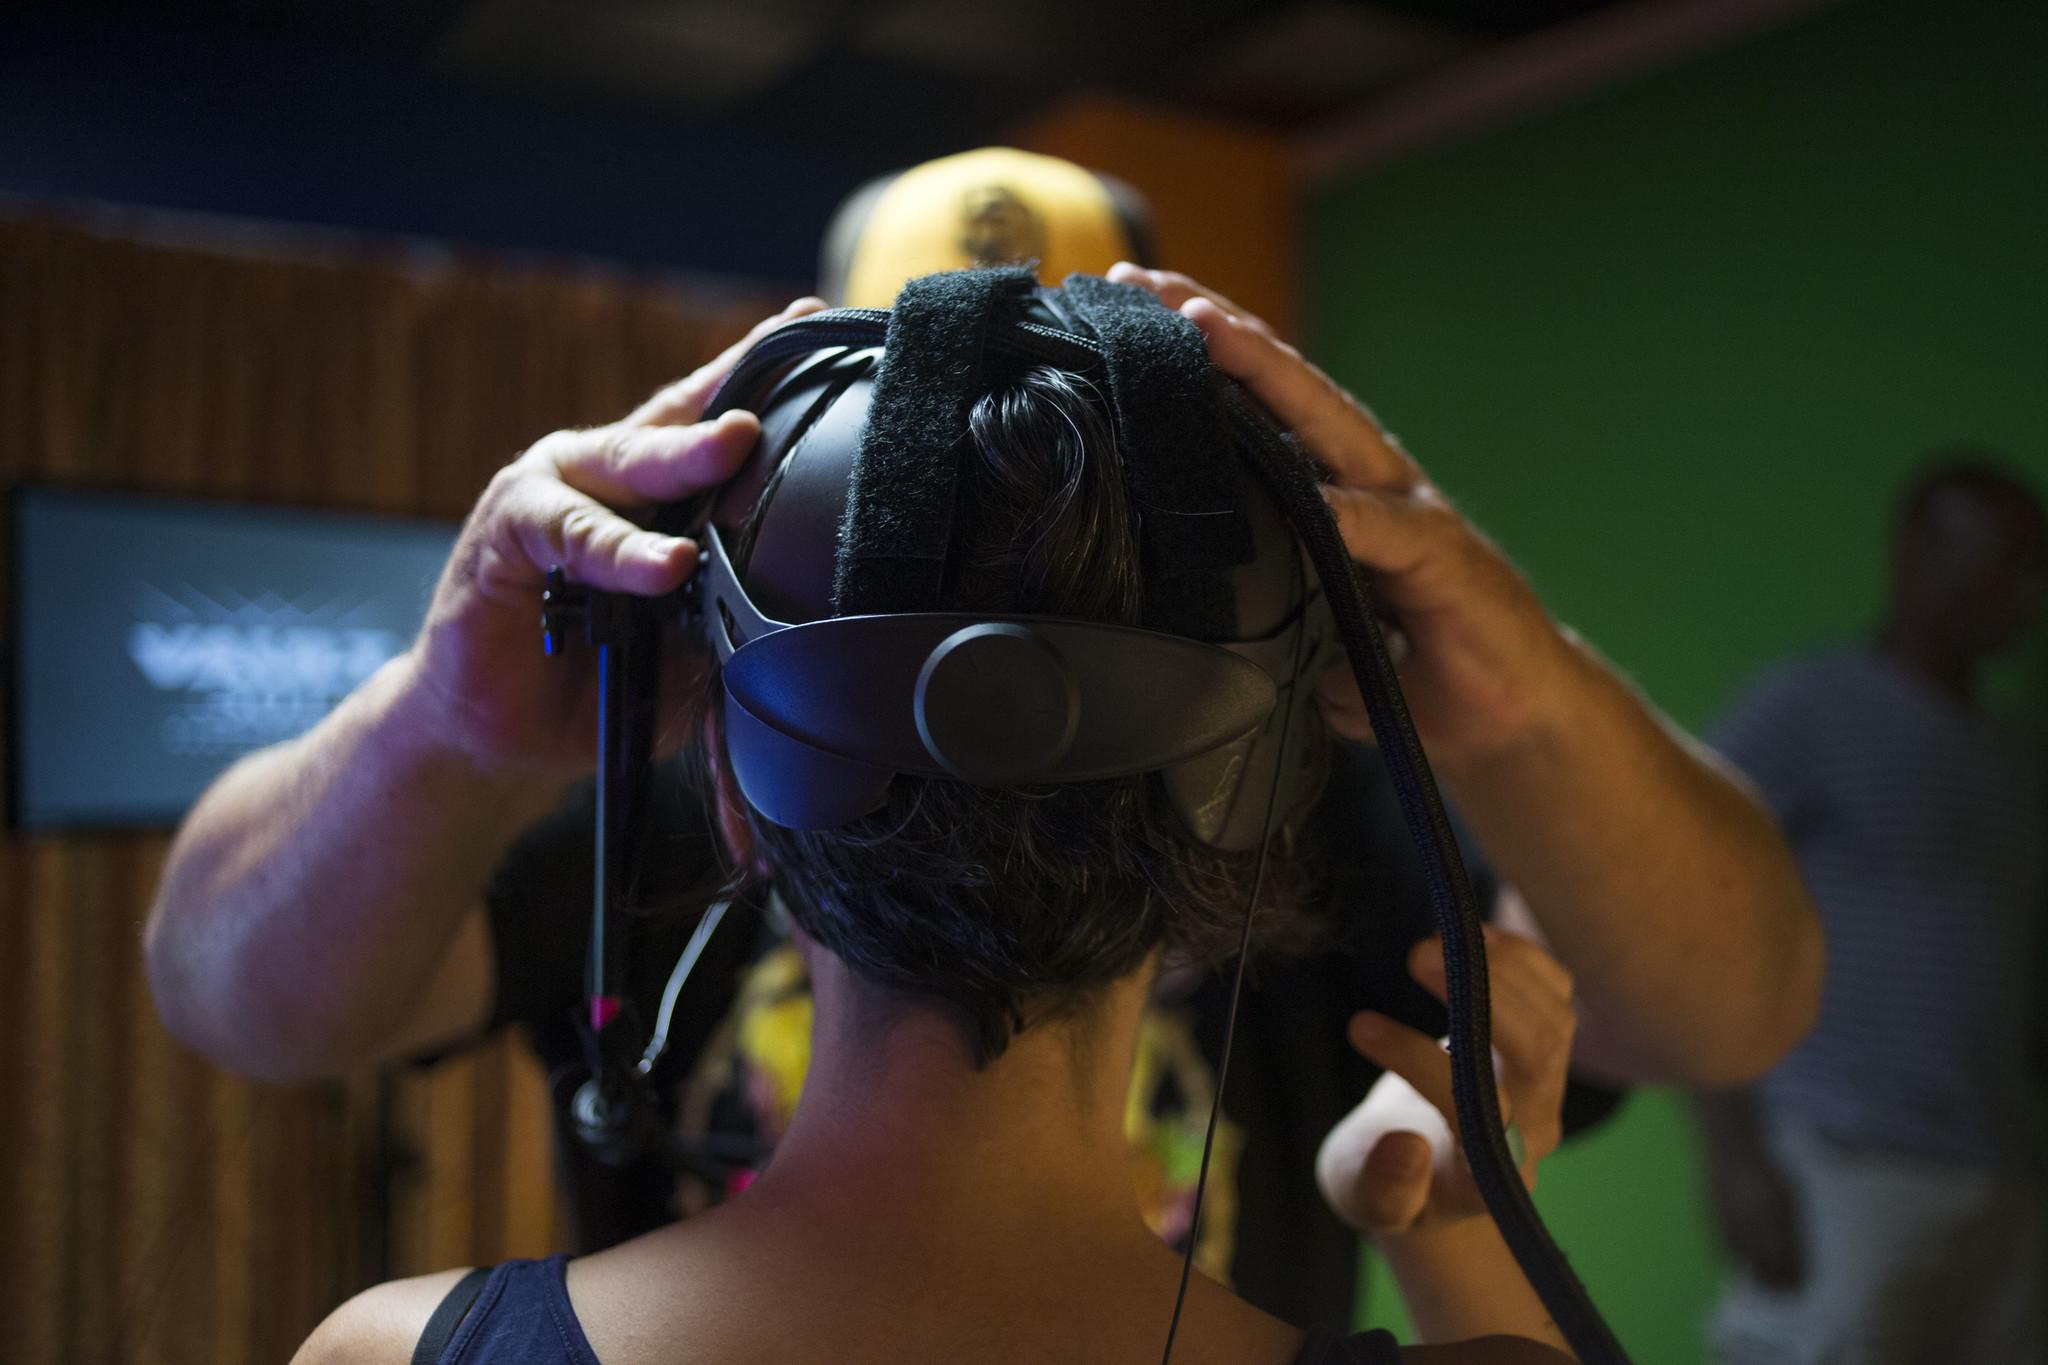 In $24 billion video game industry, voice actors struggle ...